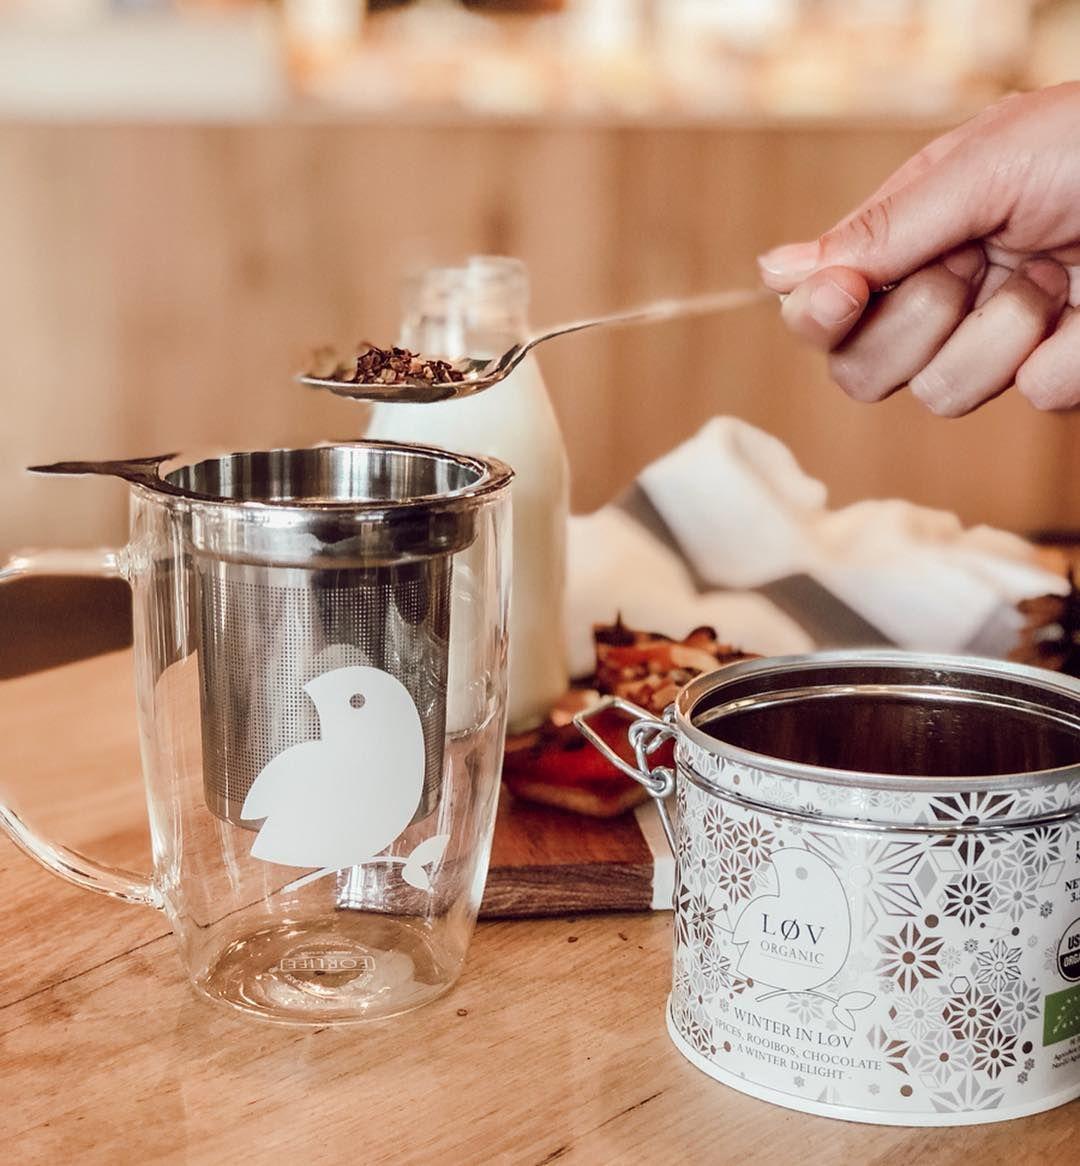 Løv Organic: 😍🍫 What's Better Than A Hot Chocolate? A